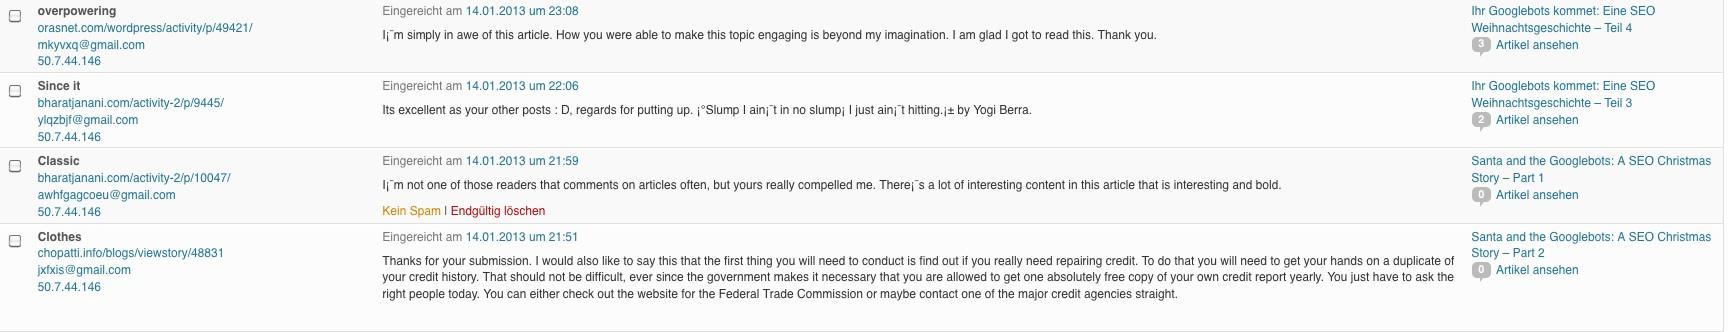 Corporate Blog Kommentarspam